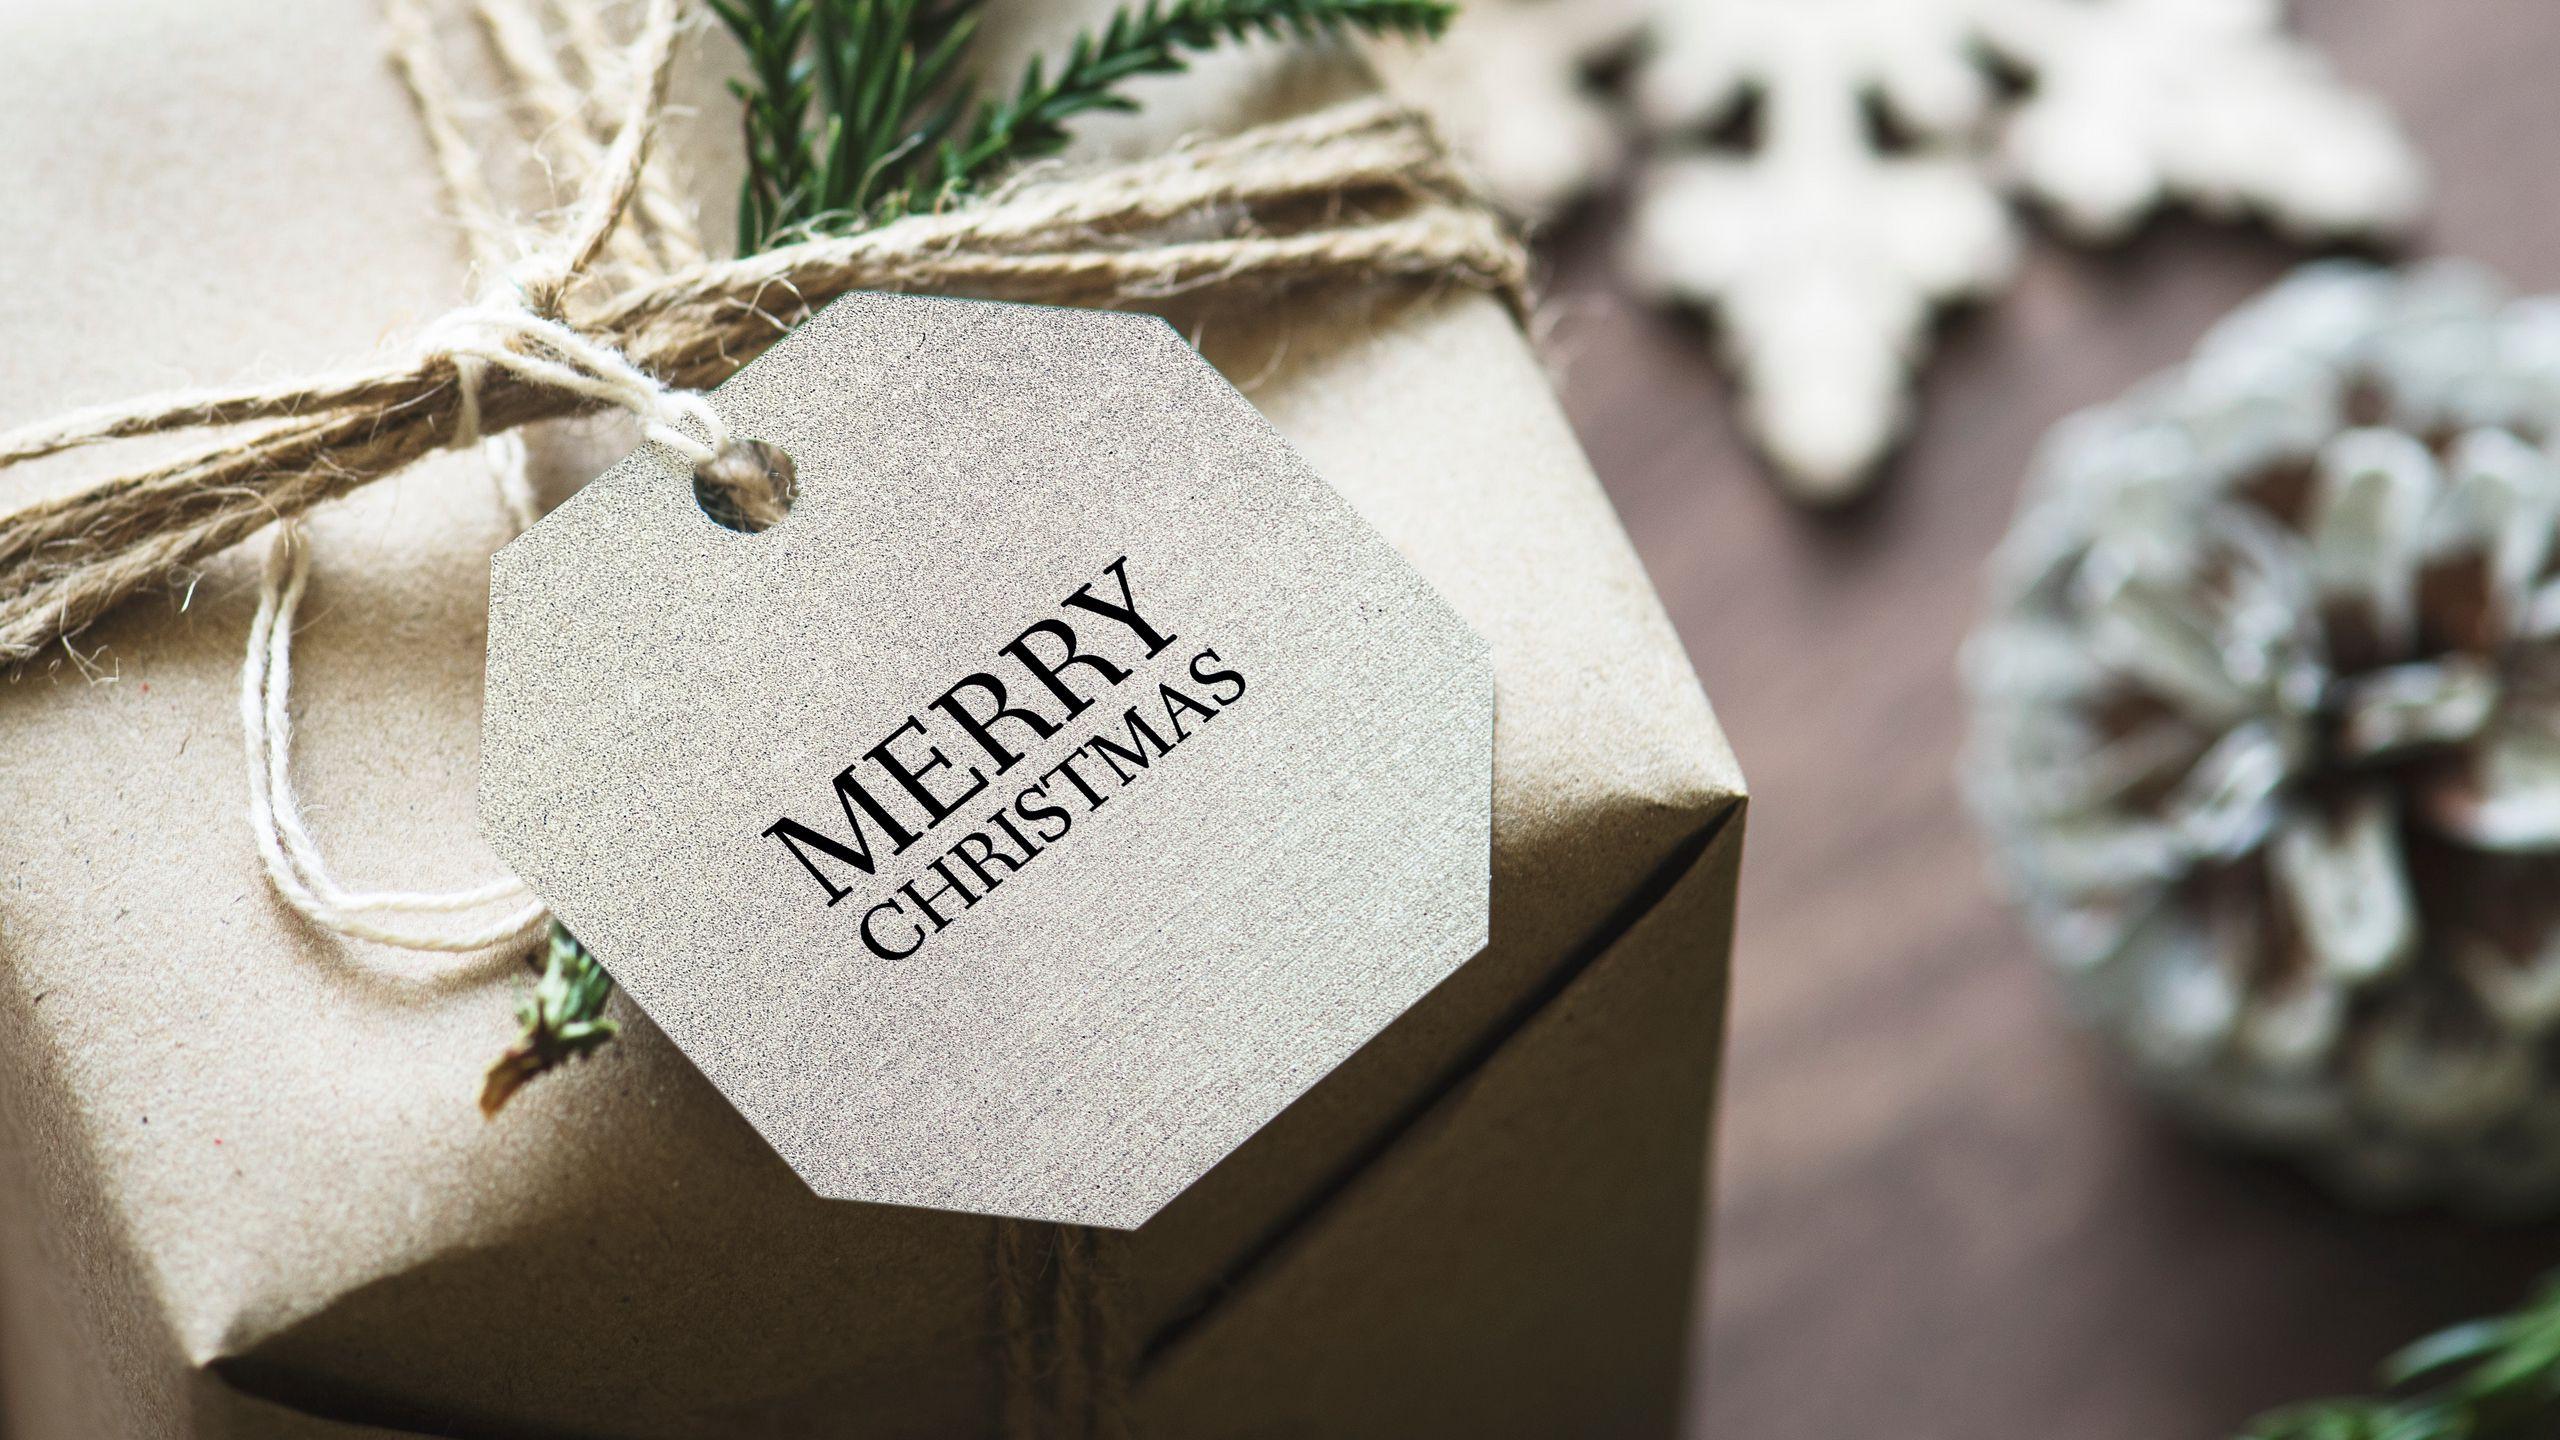 2560x1440 Wallpaper gift, christmas, new year, tag, box